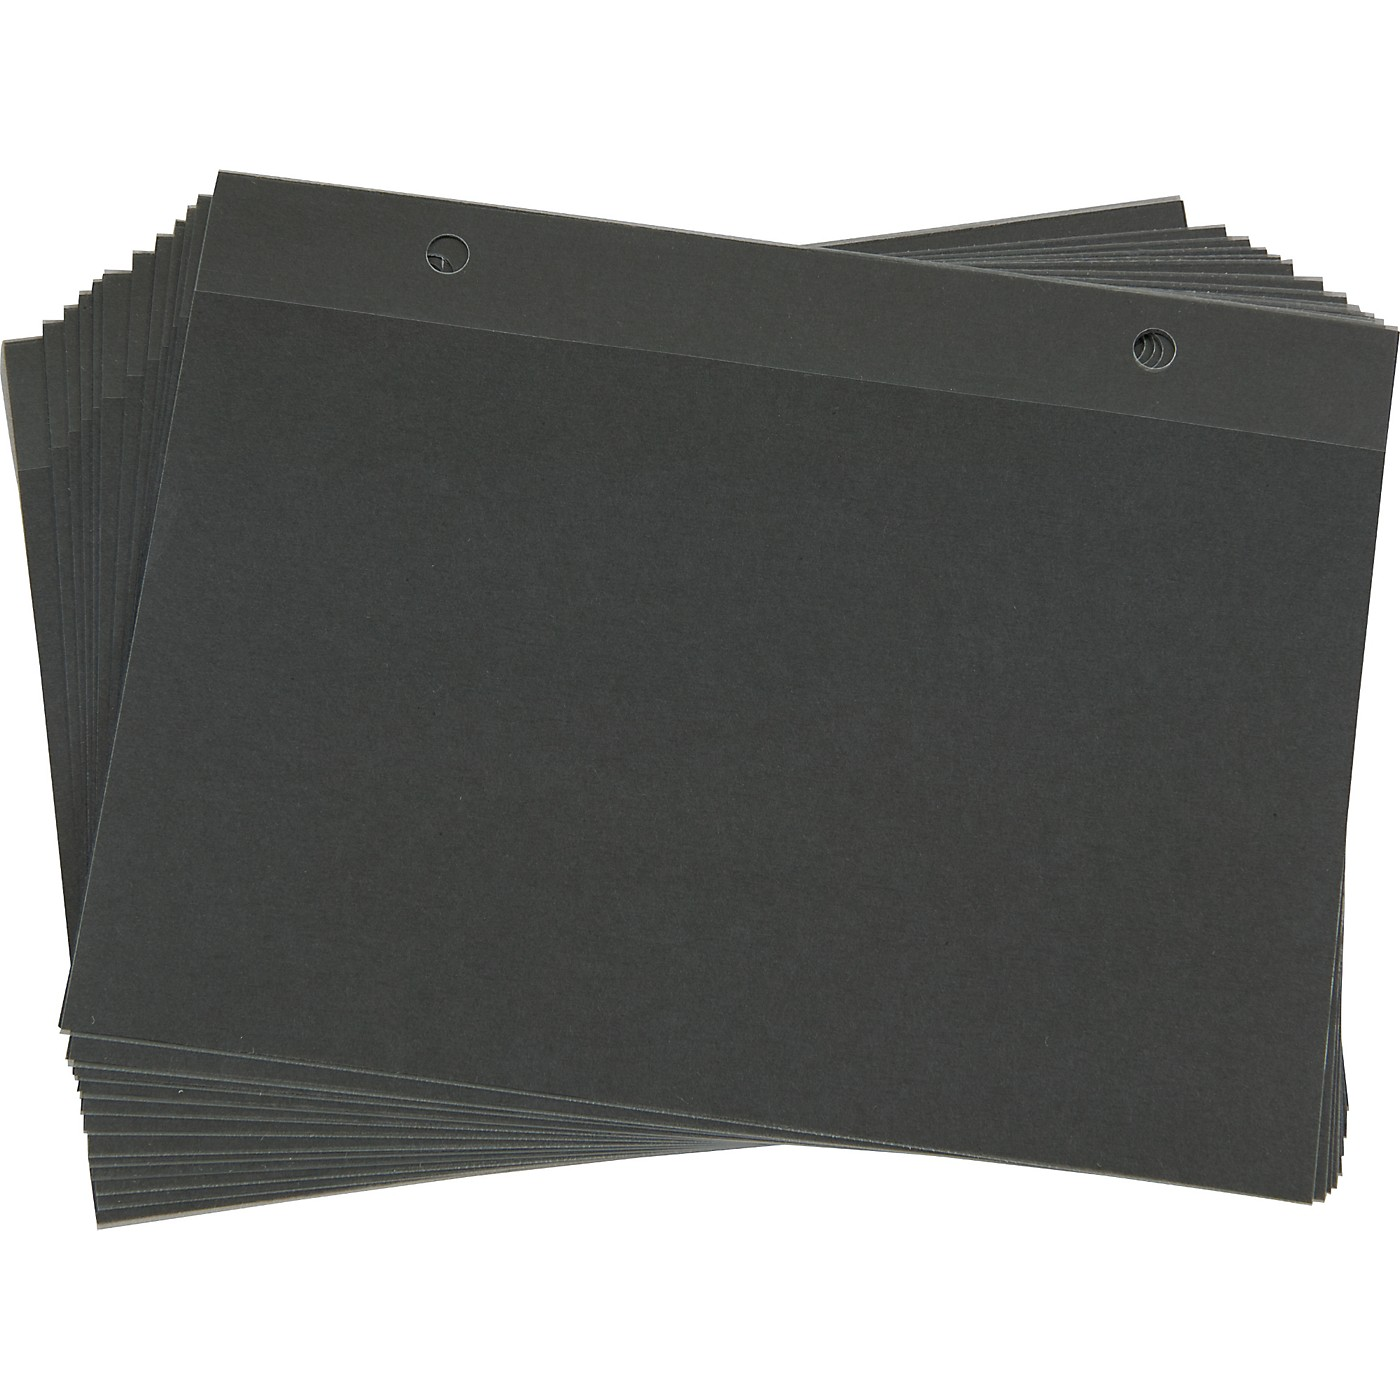 Grover-Trophy Flip Folder Replacement Windows thumbnail